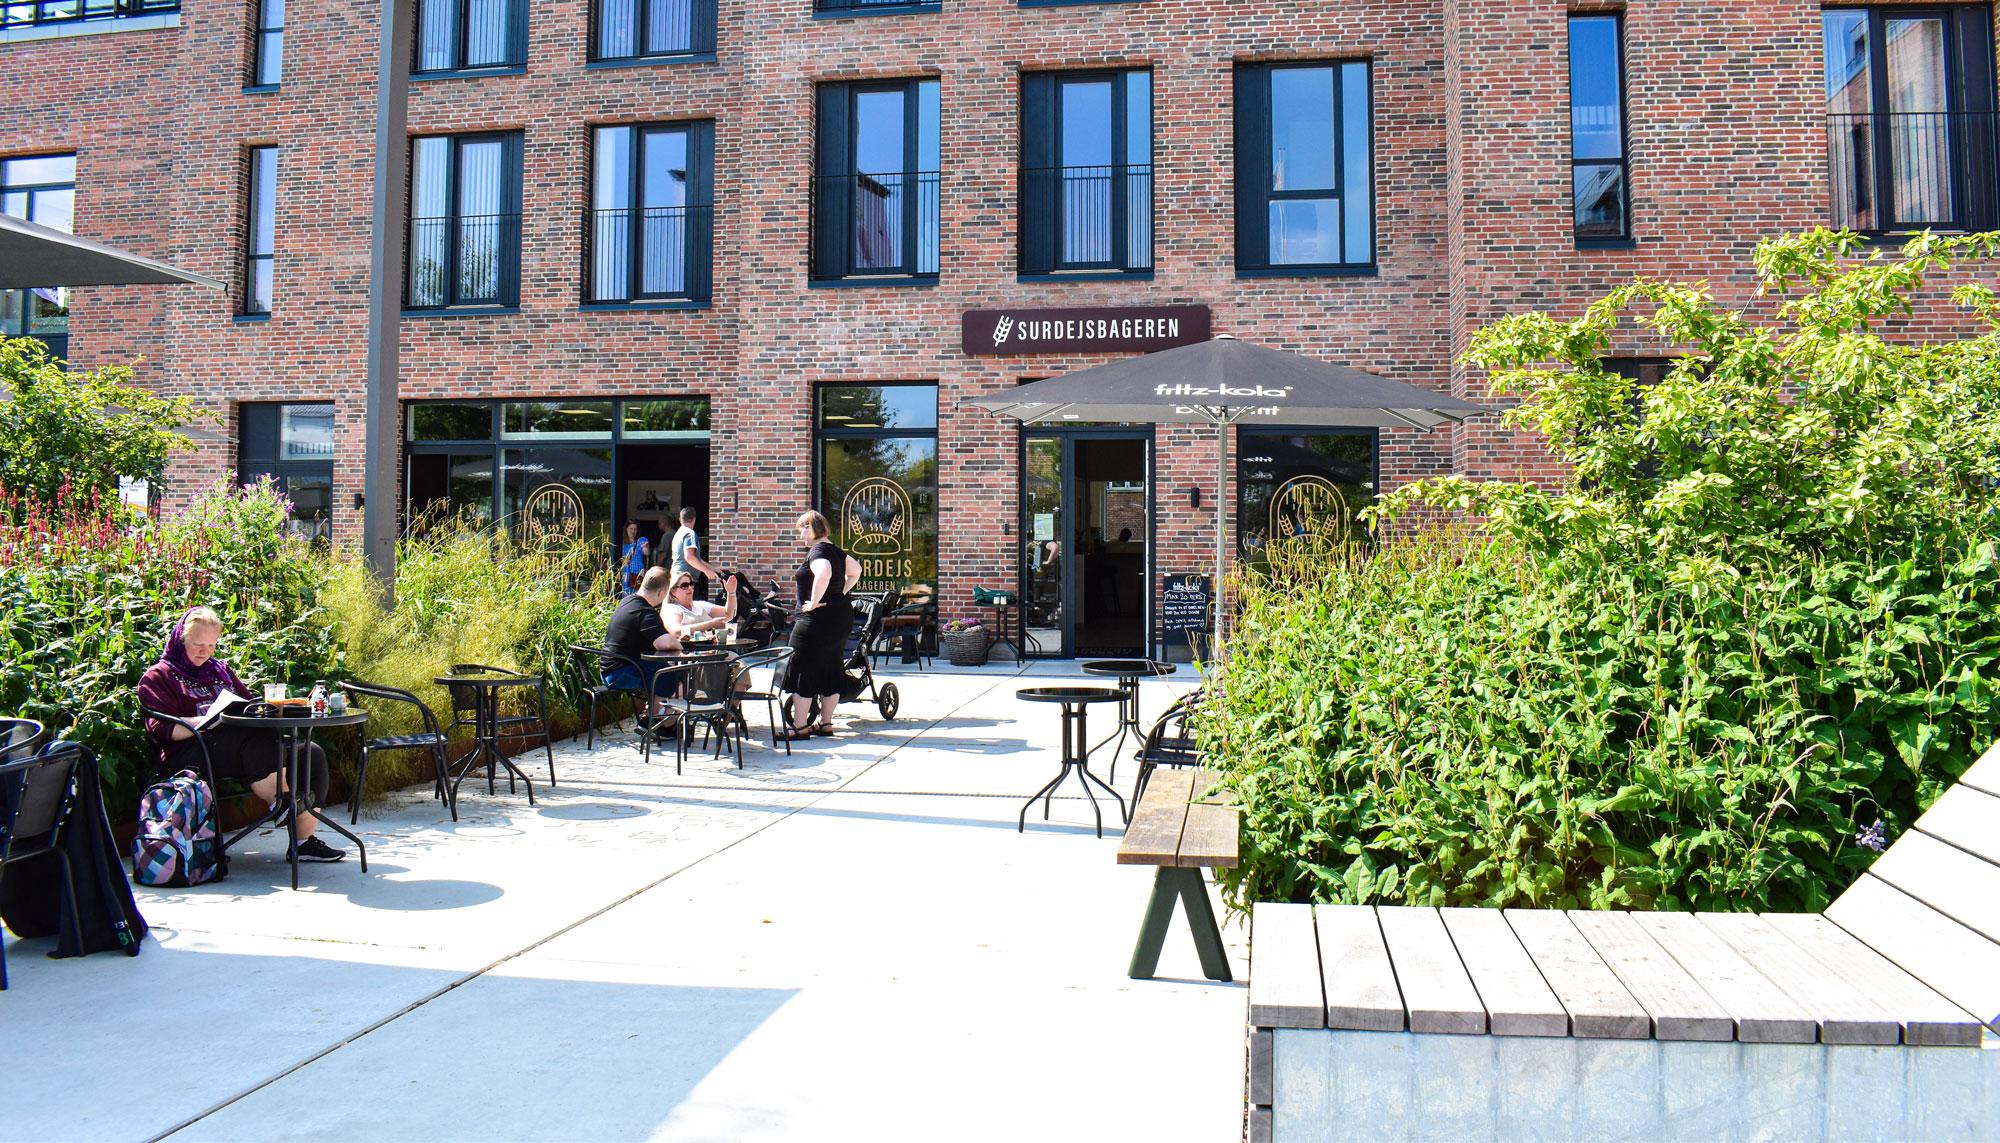 Intropris på 50 kr: Fra på søndag kan du få ikke-brunch i Aalborg